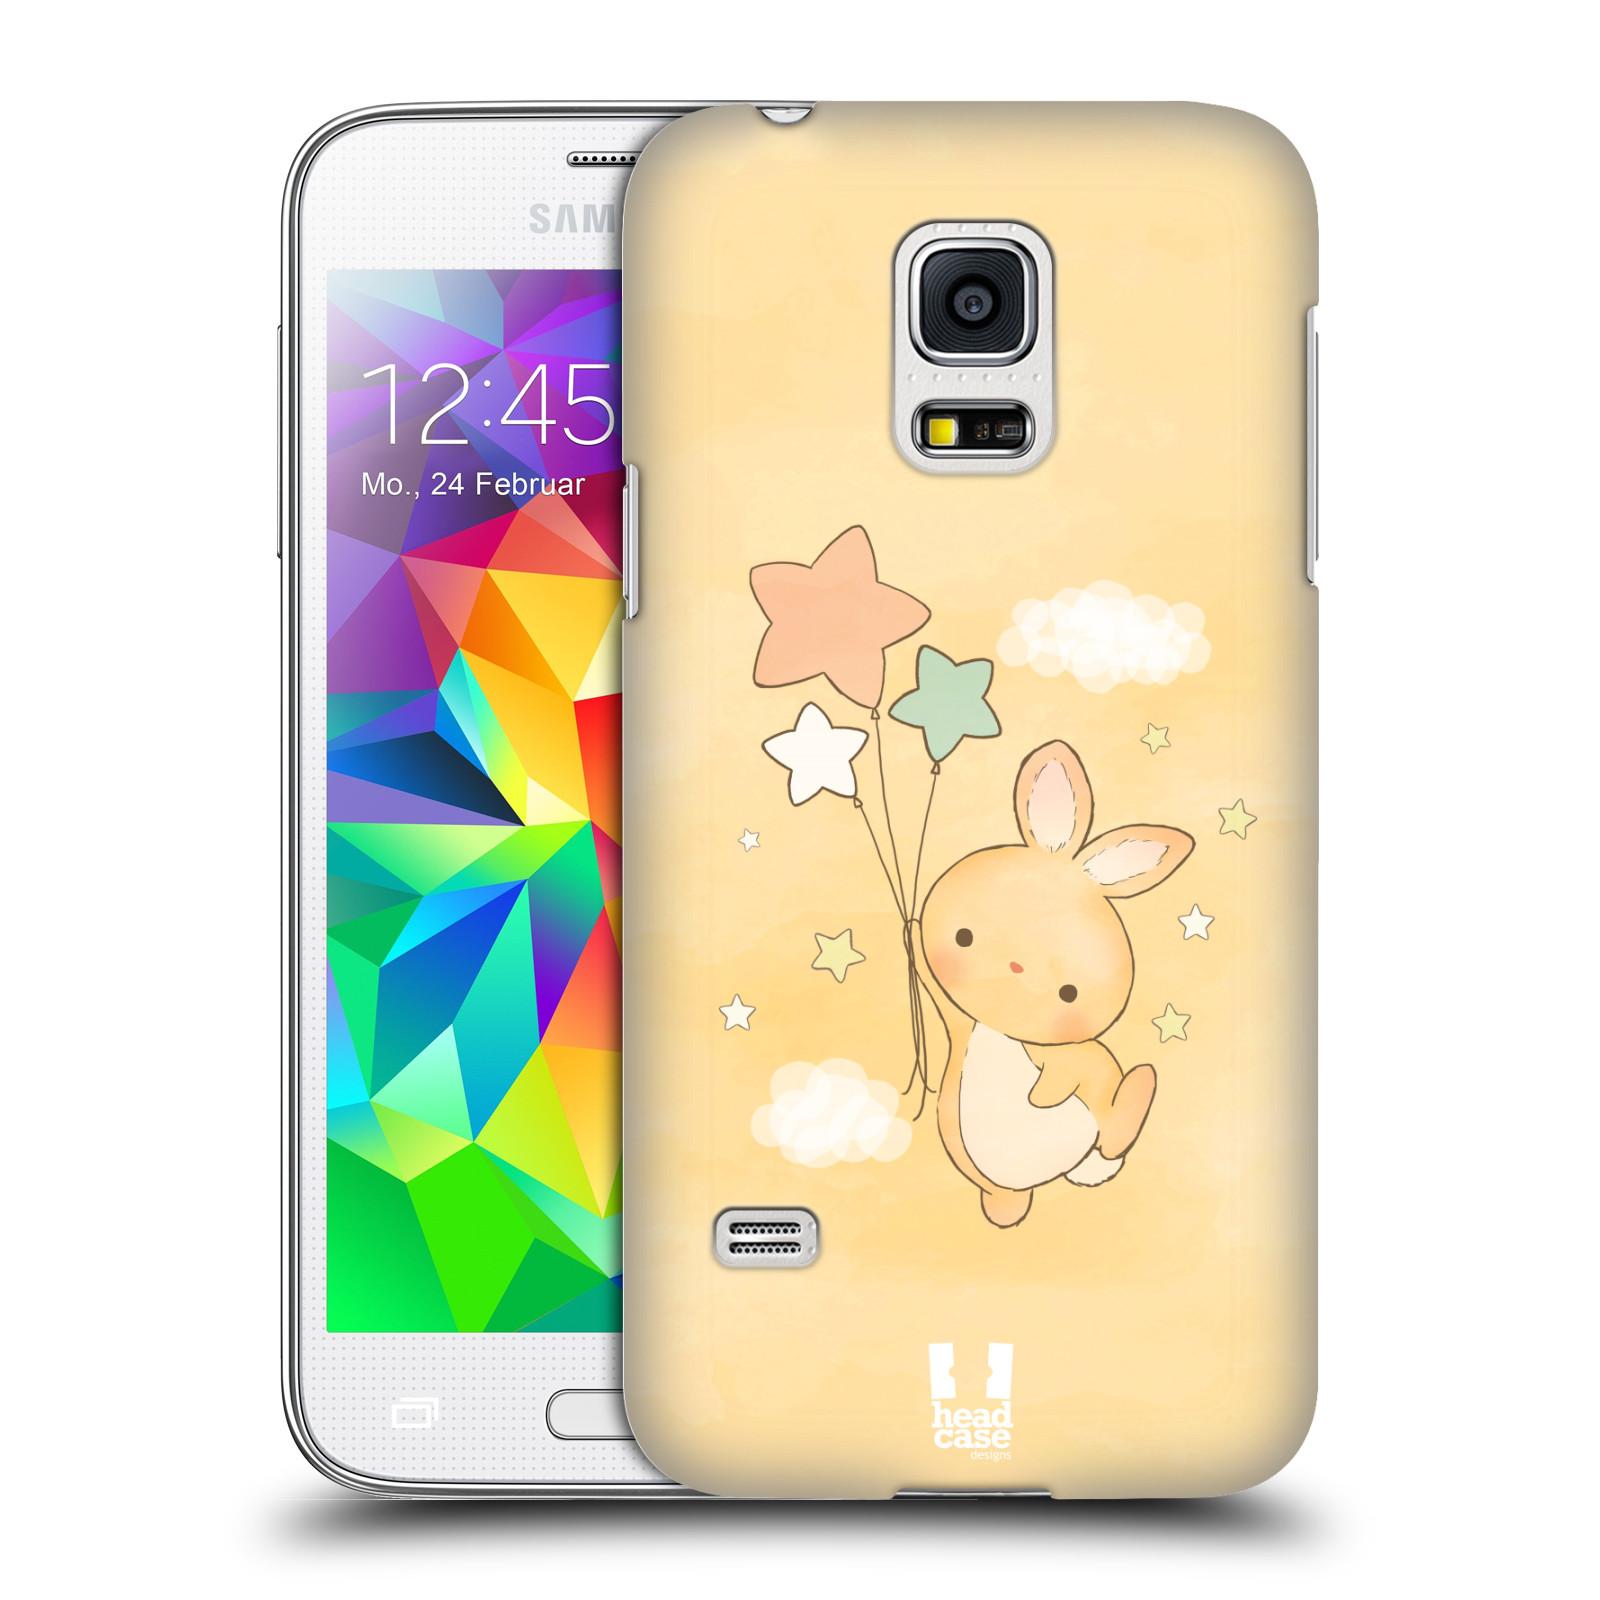 HEAD CASE plastový obal na mobil SAMSUNG Galaxy S5 MINI / S5 MINI DUOS vzor králíček a hvězdy žlutá